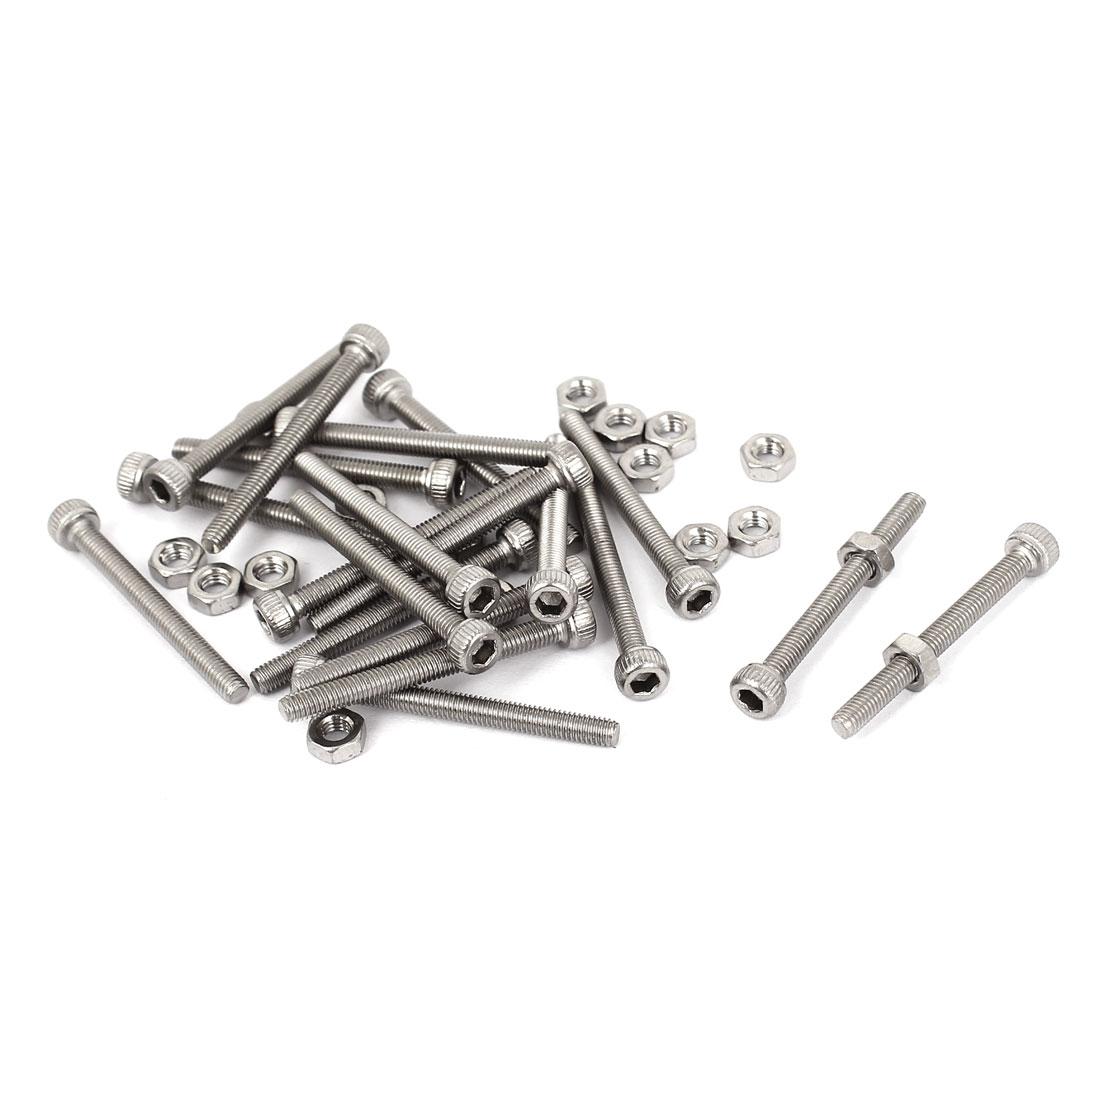 M3x30mm Stainless Steel Hex Socket Head Knurled Cap Screws Bolts Nut Set 20Pcs